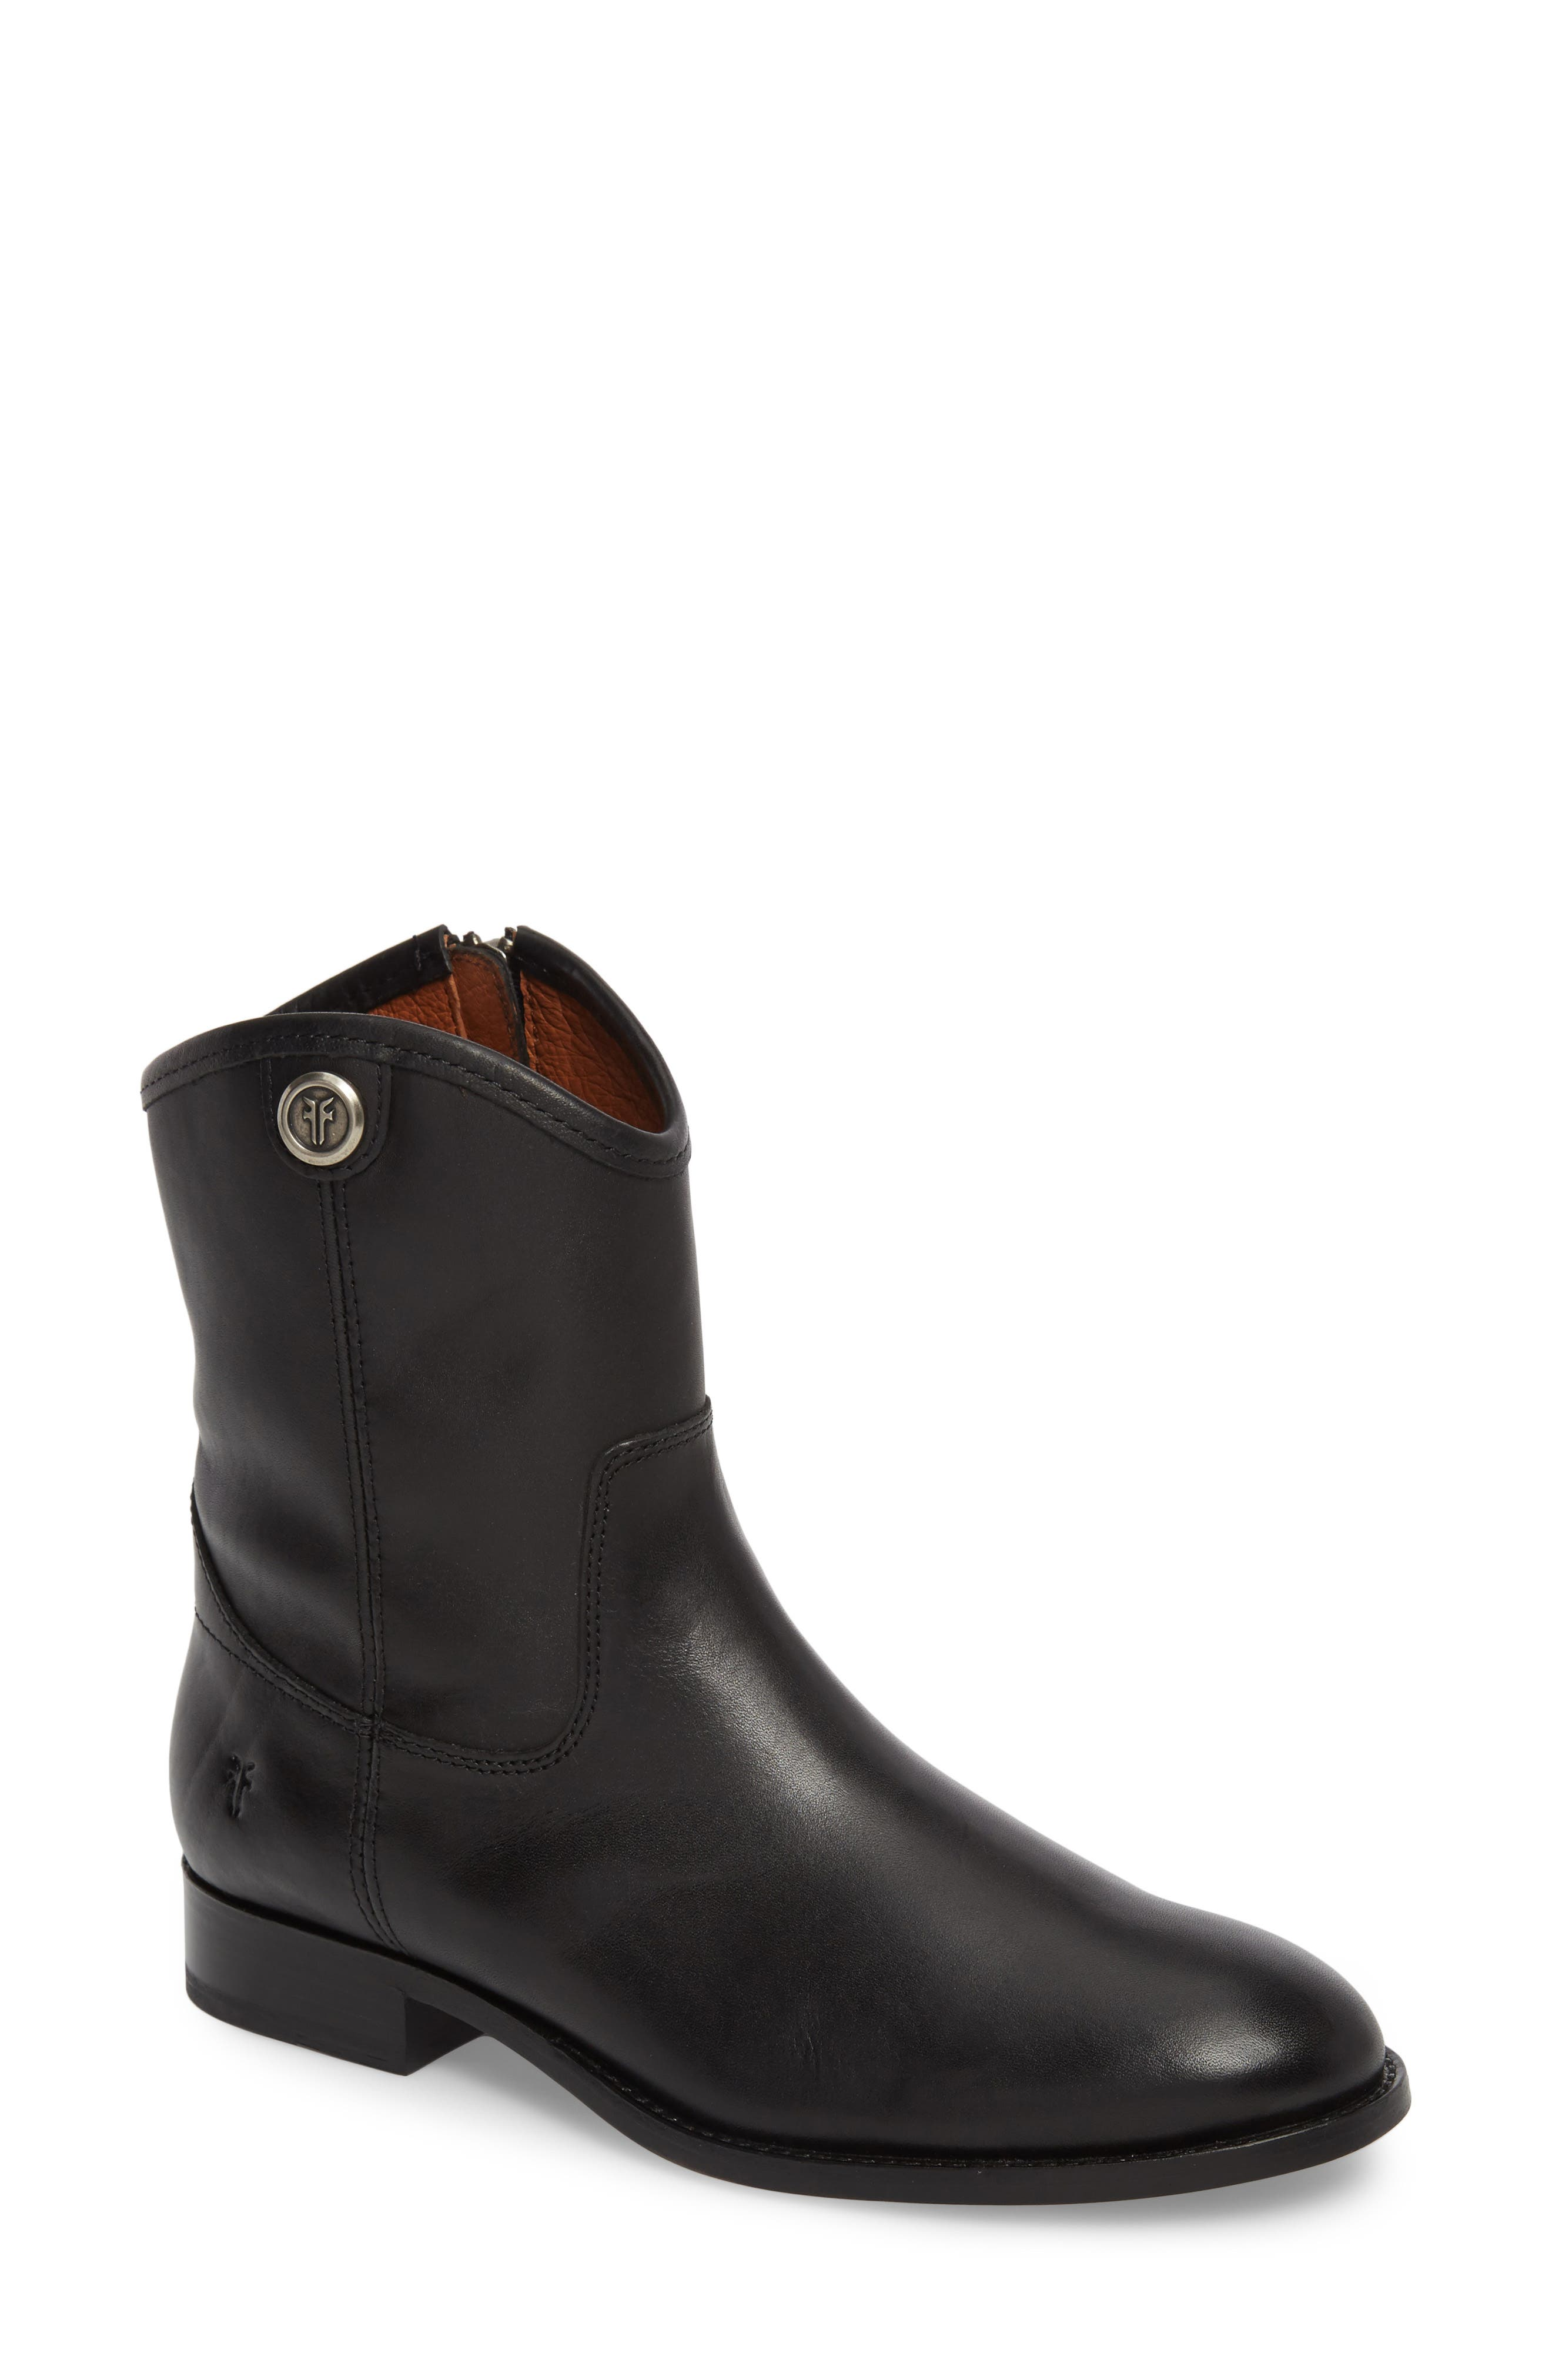 Melissa Short 2 Boot,                         Main,                         color, BLACK LEATHER